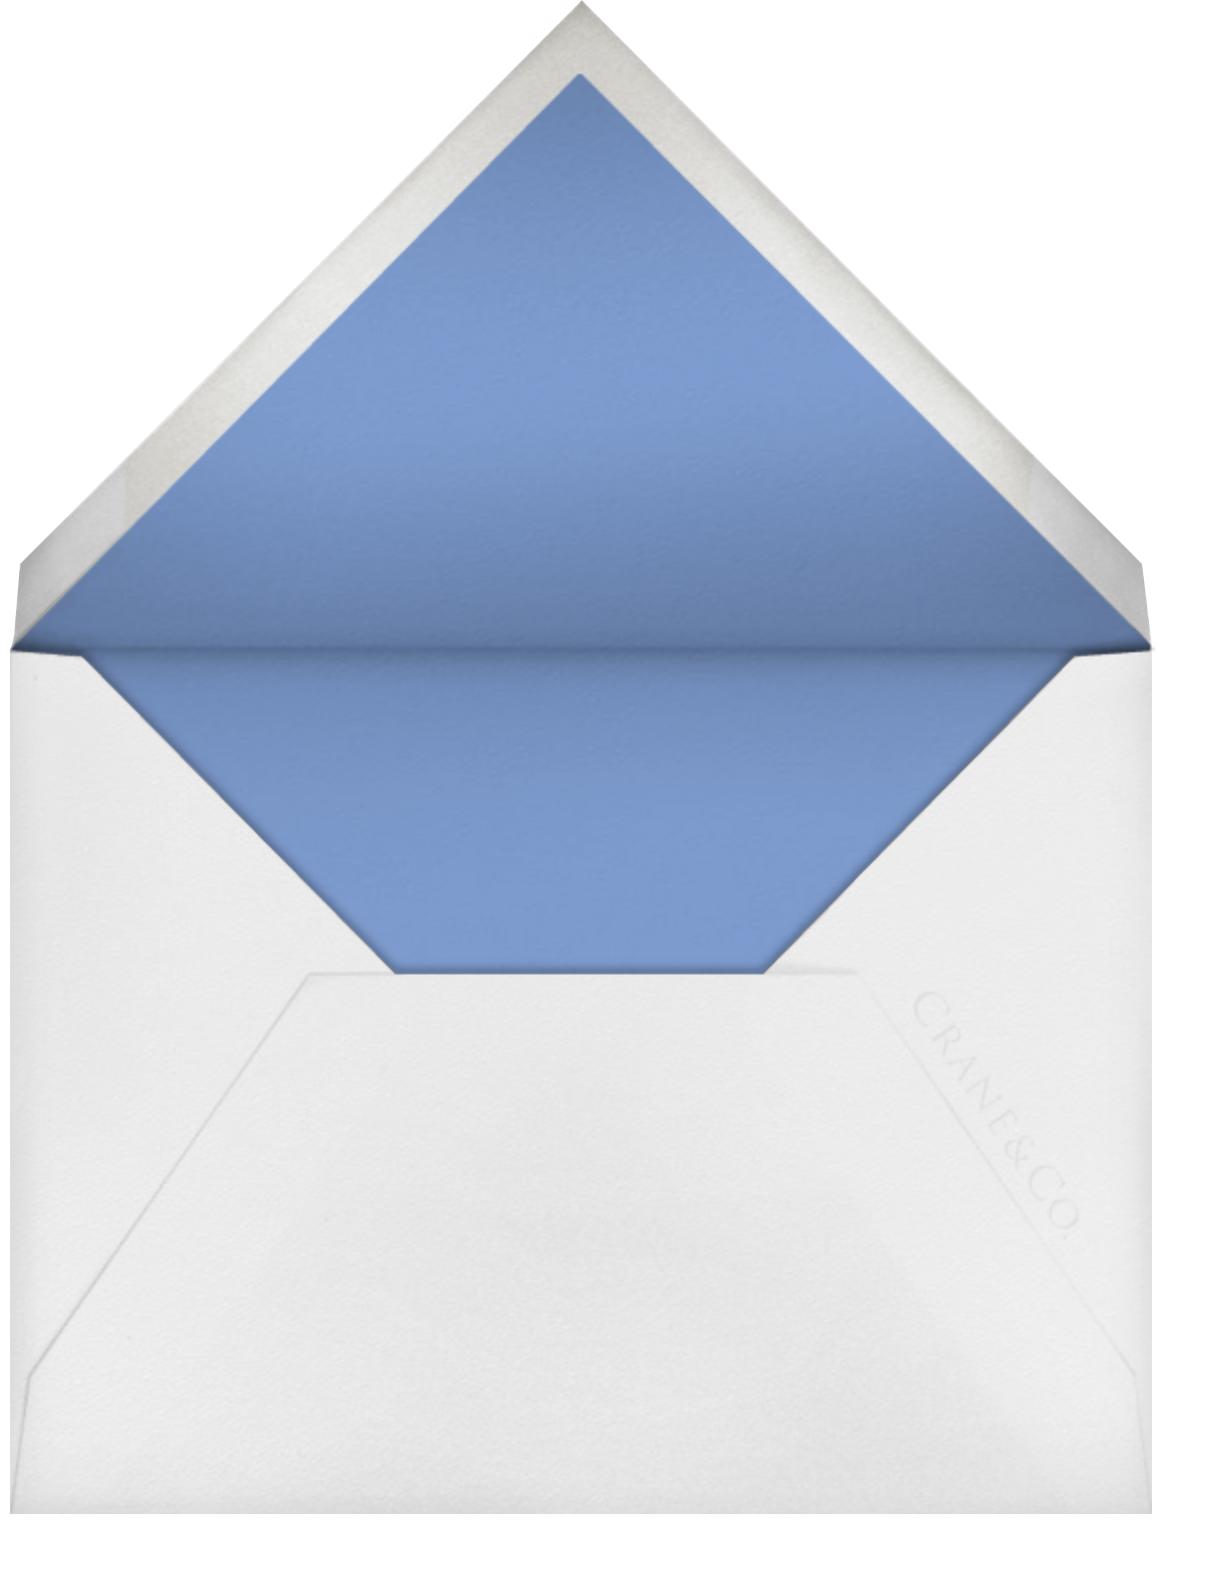 Principle (Stationery) - Newport Blue - Vera Wang - Envelope